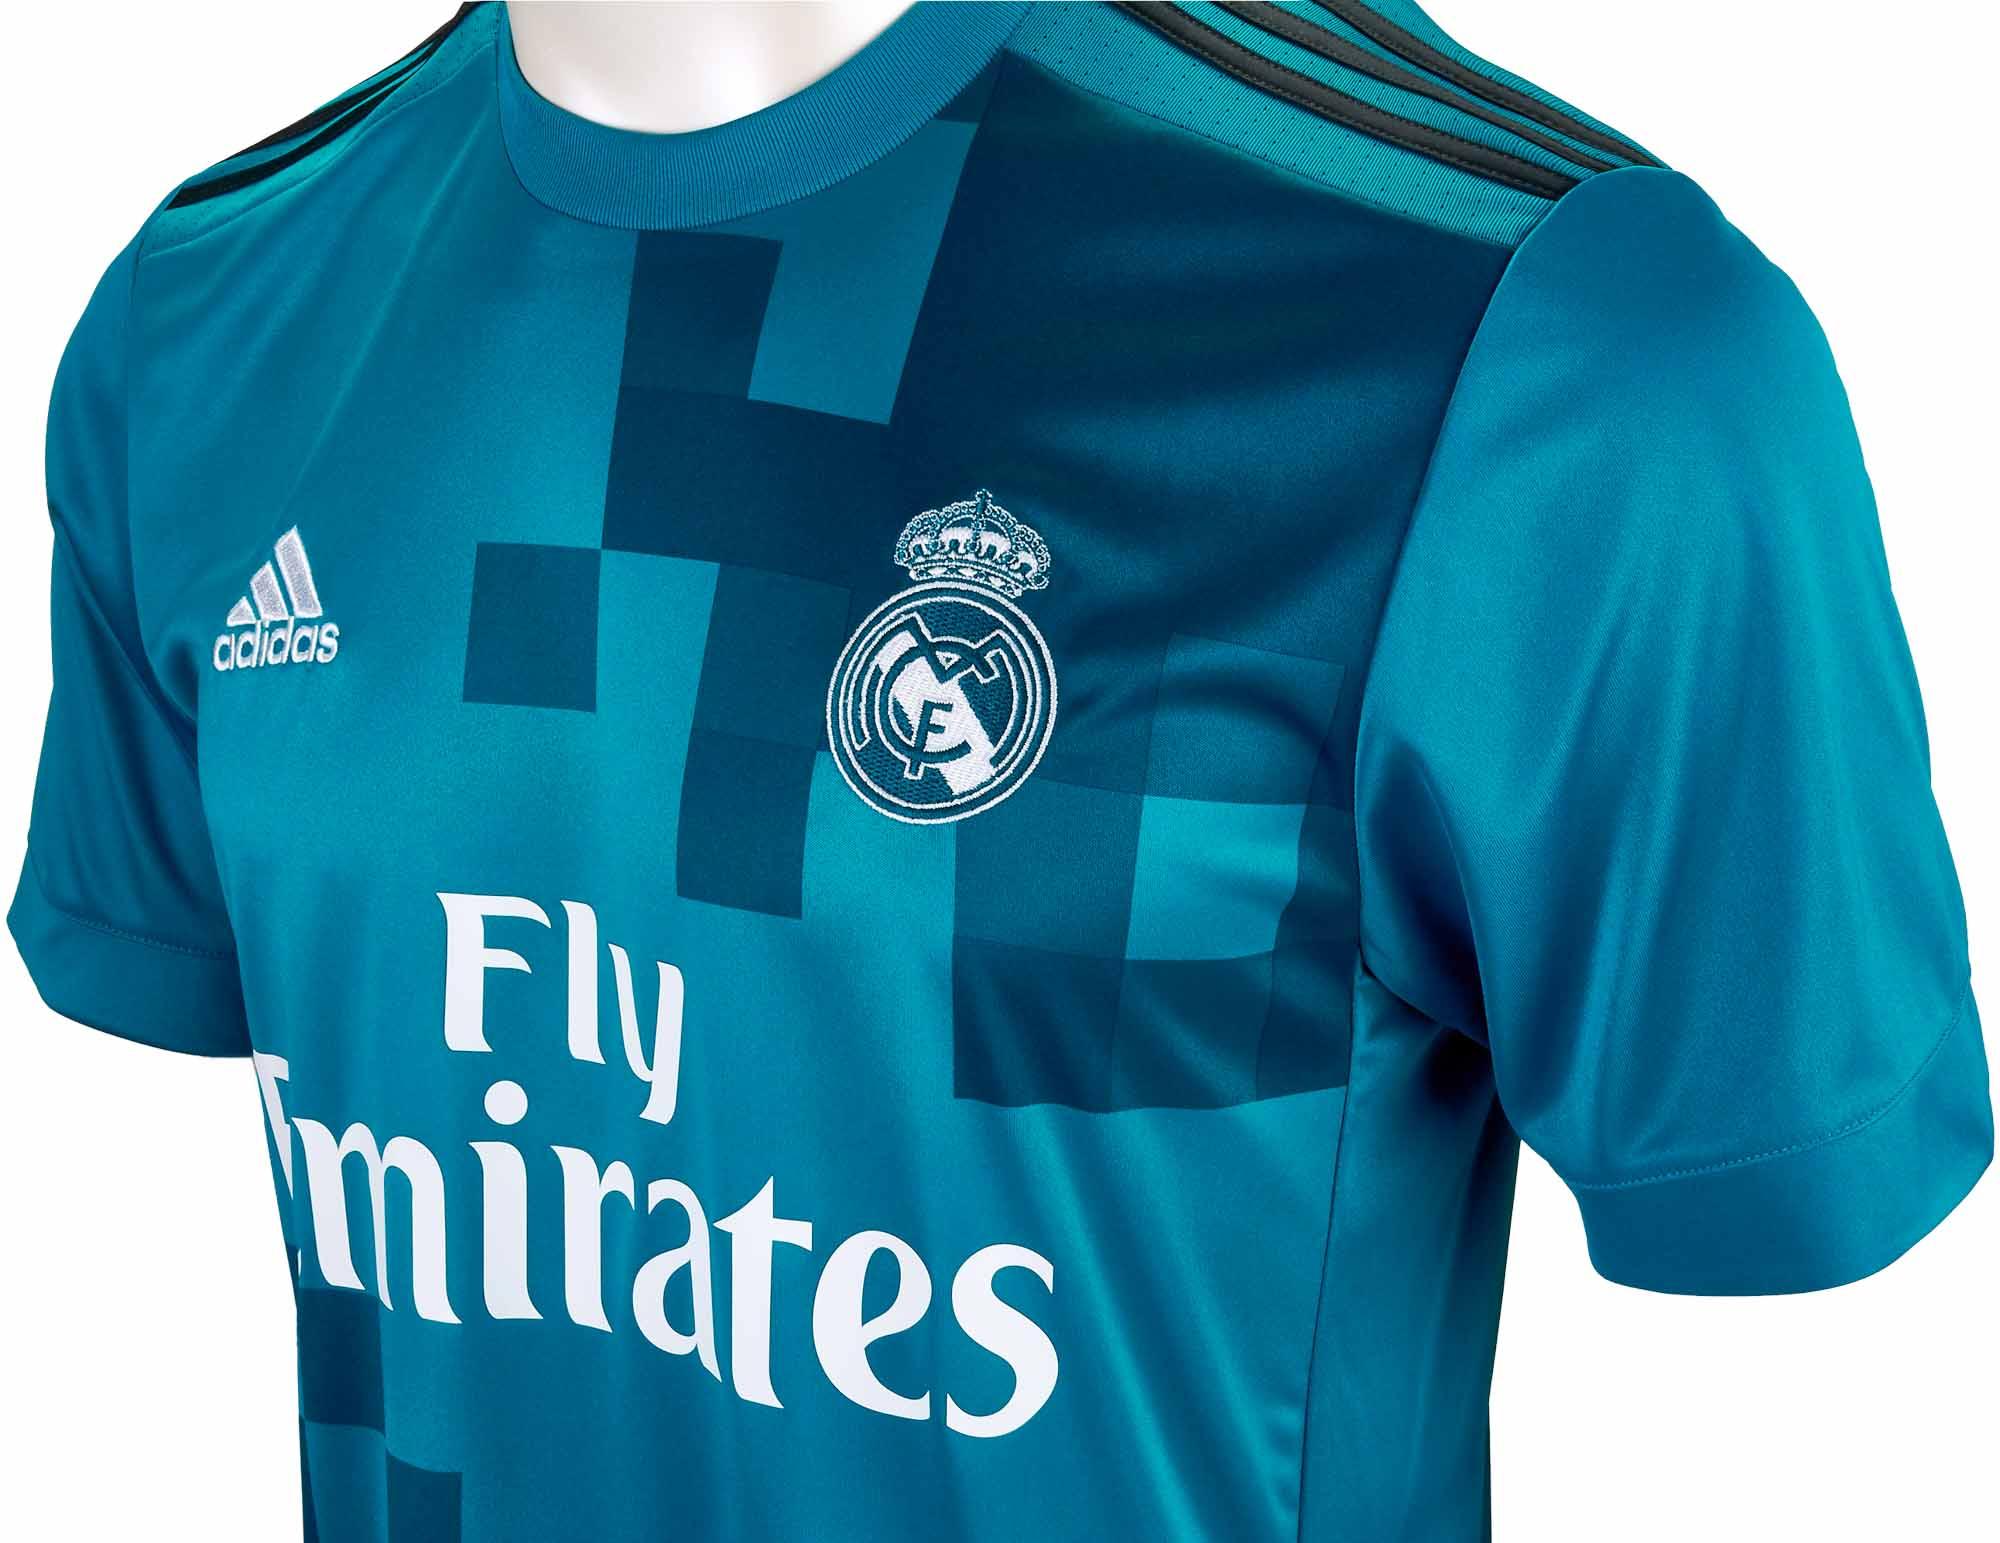 959c8fc025554 Kids 2017/18 adidas Real Madrid 3rd Jersey - Soccer Master